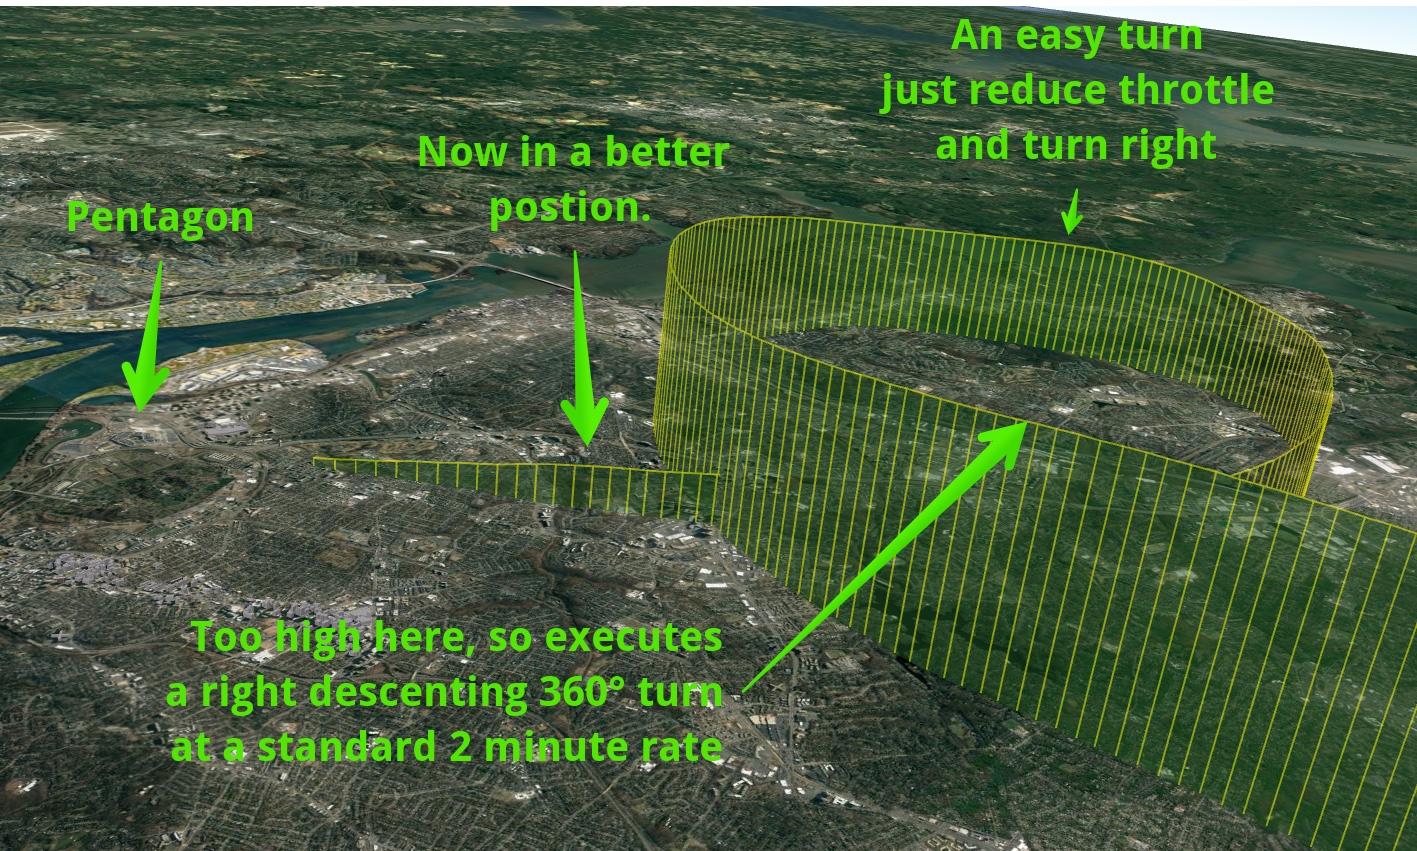 Google Earth Pro 2018-01-16 13-15-29.jpg